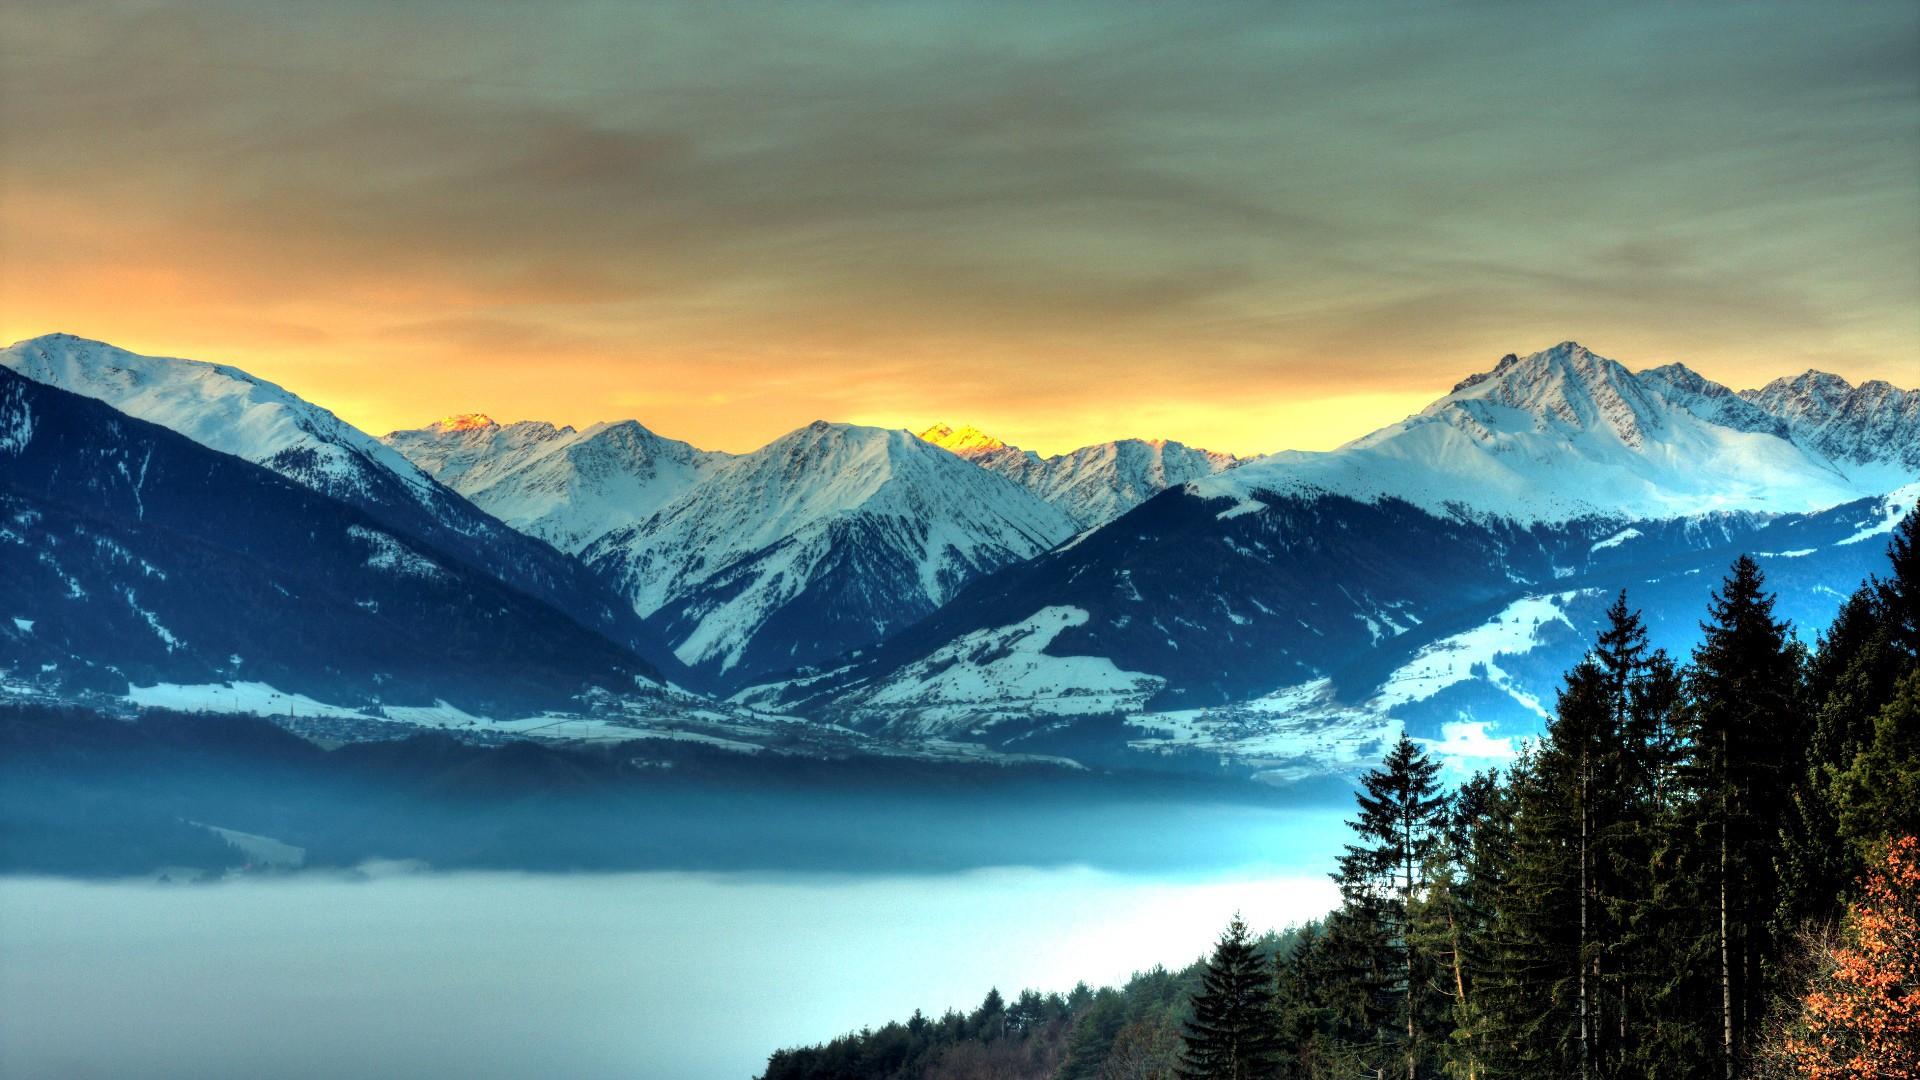 High Definition Mountain Wallpaper